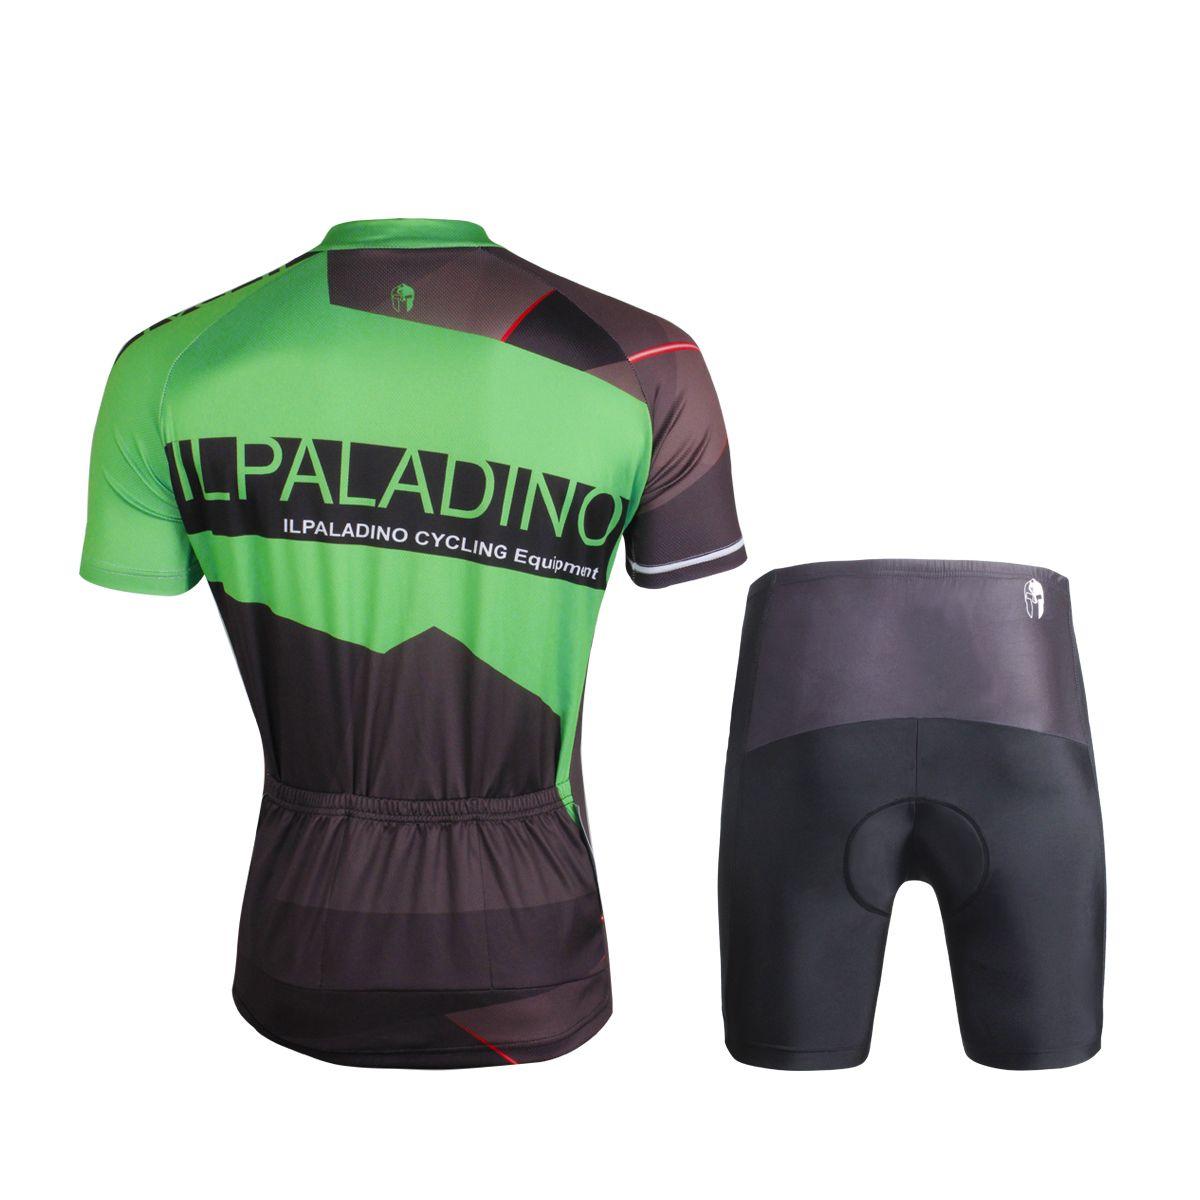 Cycling T Shirts Funny Cycling T Shirts Cycling T Shirts Retro